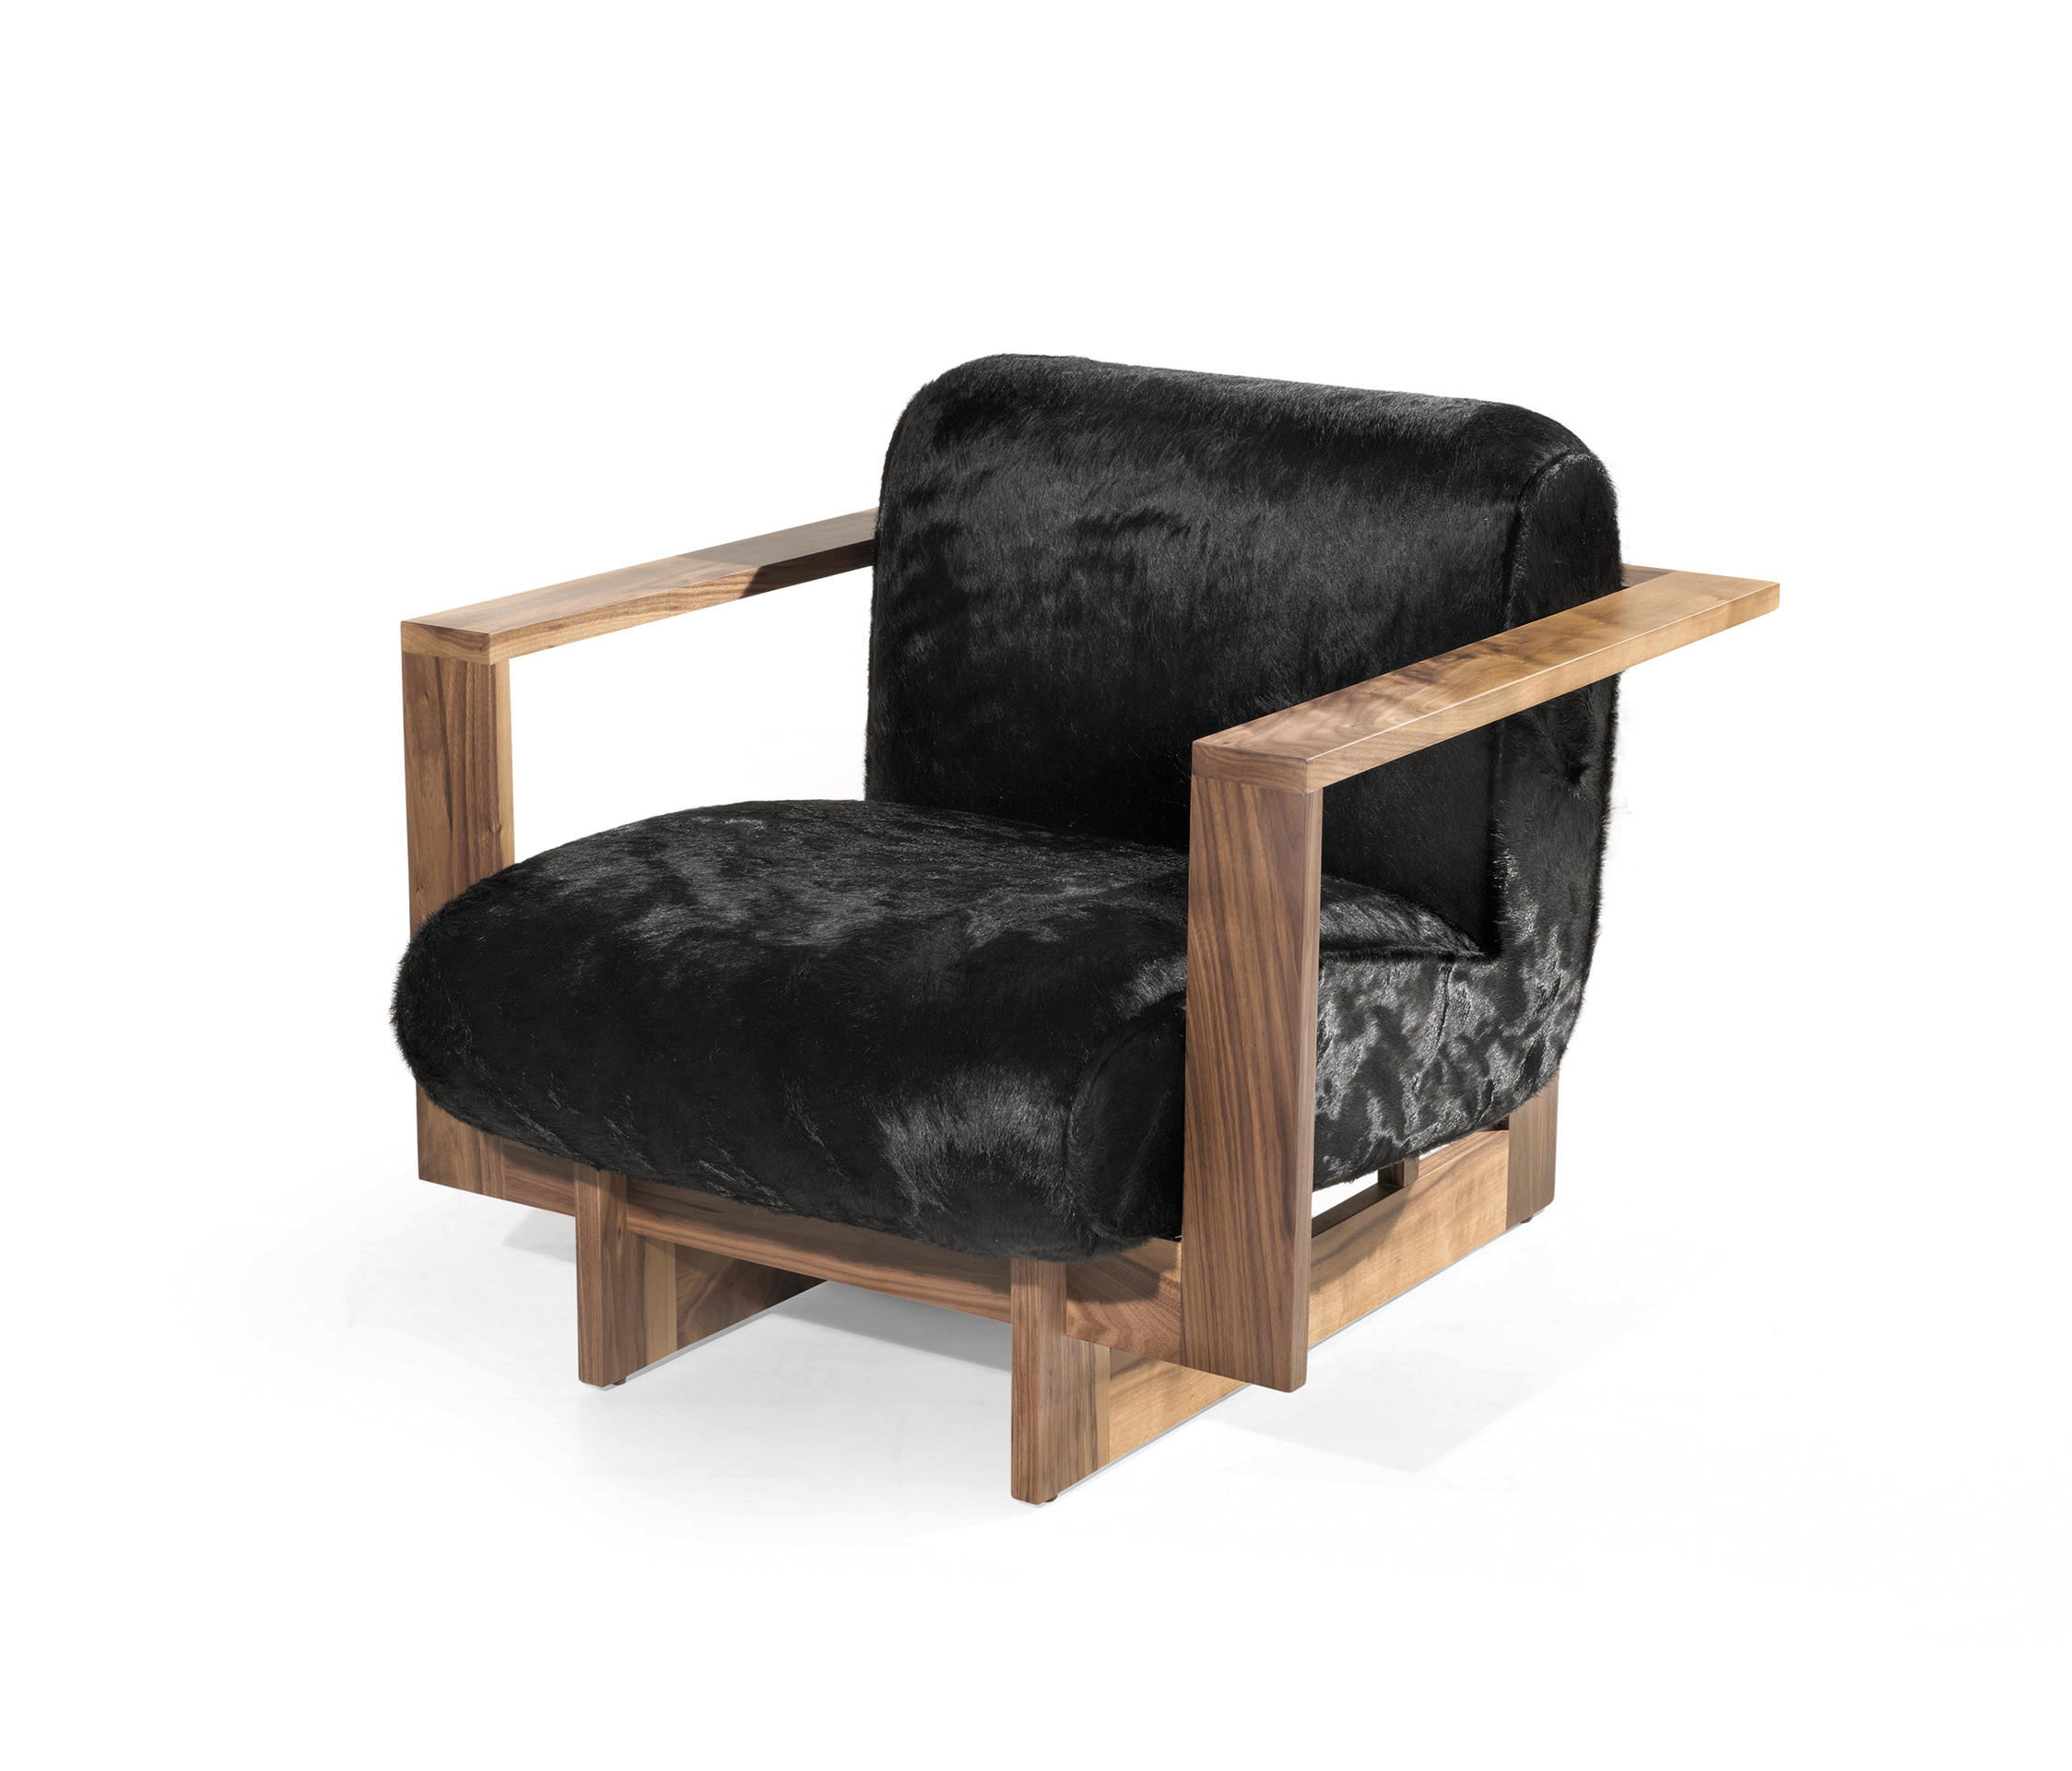 Cubist Lounge Chair by Vladimir Kagan | Armchairs  sc 1 st  Architonic & CUBIST LOUNGE CHAIR - Armchairs from Vladimir Kagan | Architonic